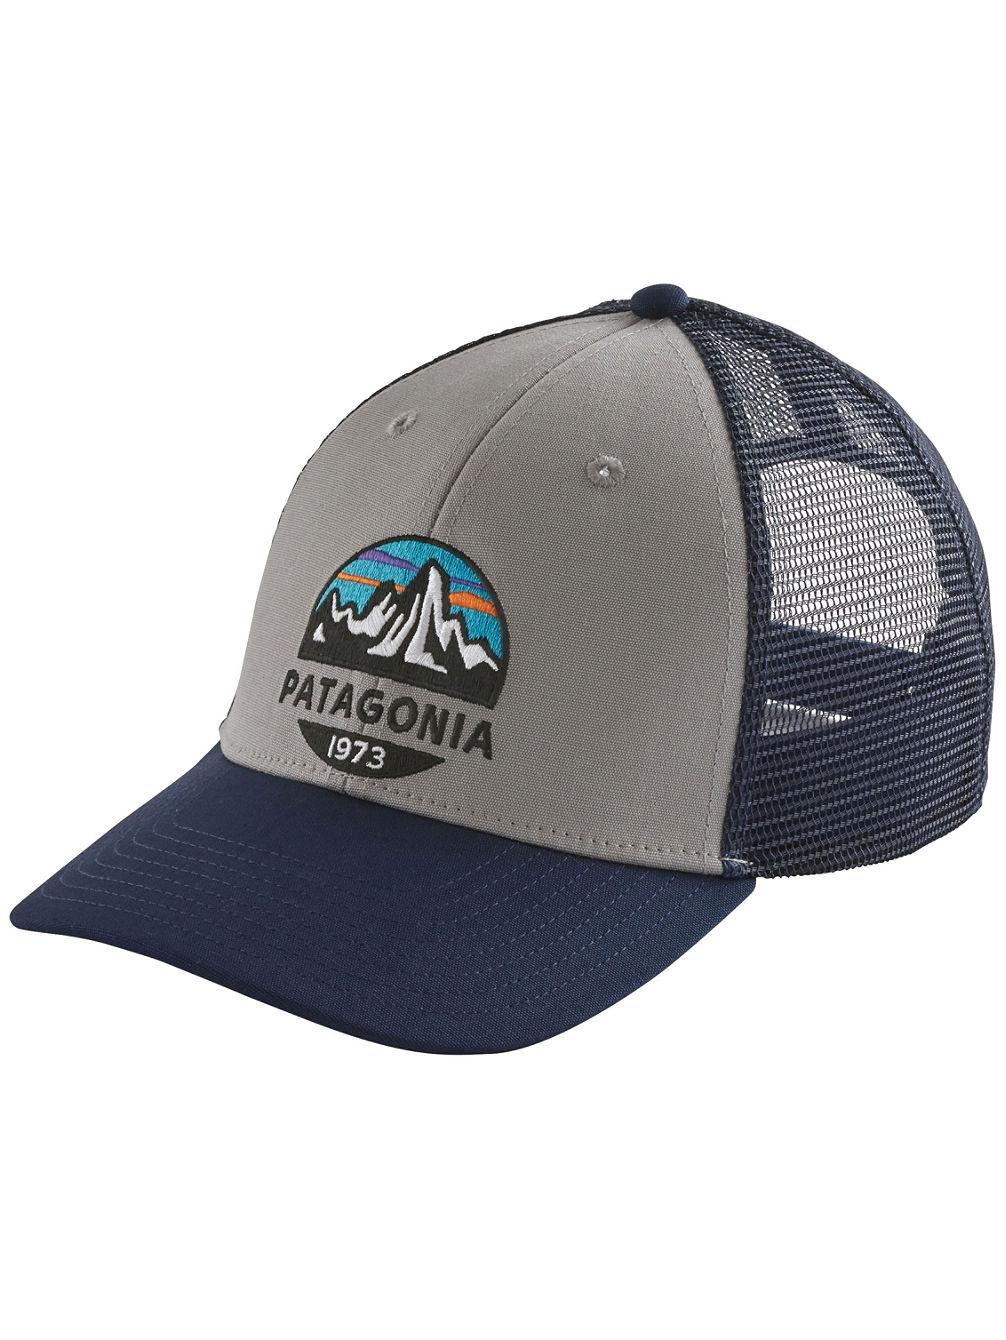 Compra Patagonia Fitz Roy Scope Lopro Trucker Cappello online su  blue-tomato.com af2b51734c57